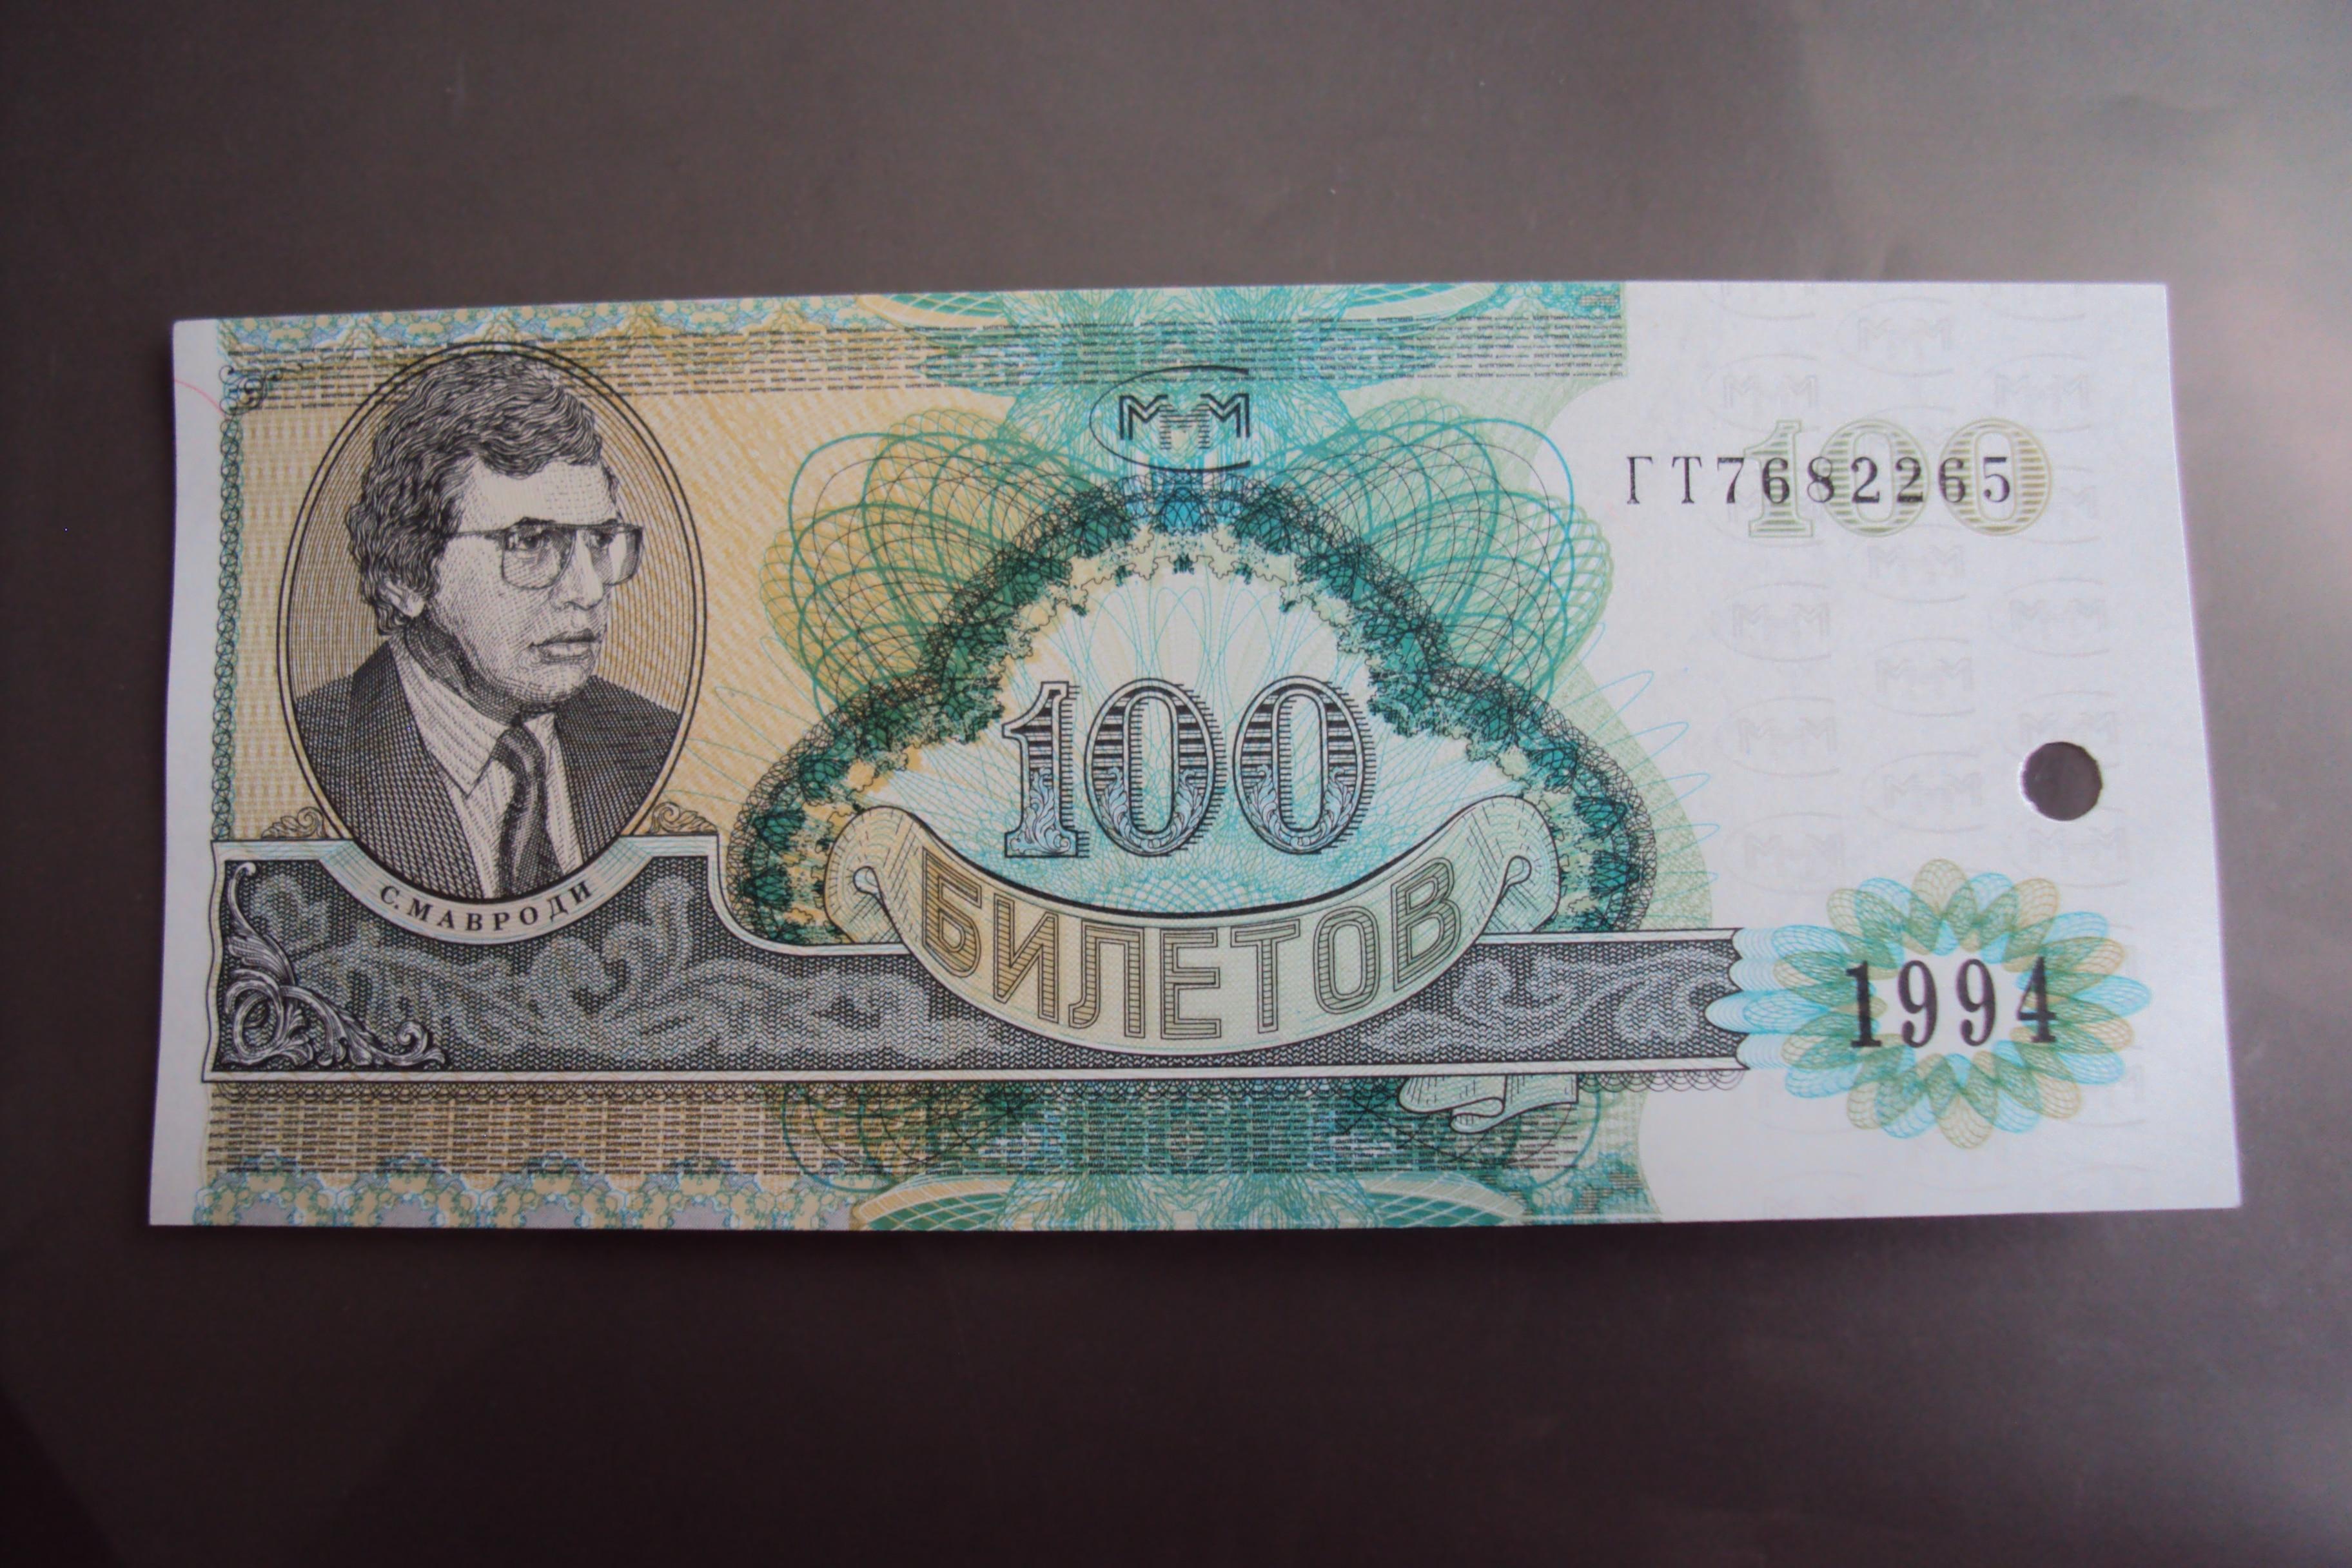 МММ: 100 билетов 1994 года. Без обращения. ОРИГИНАЛ.